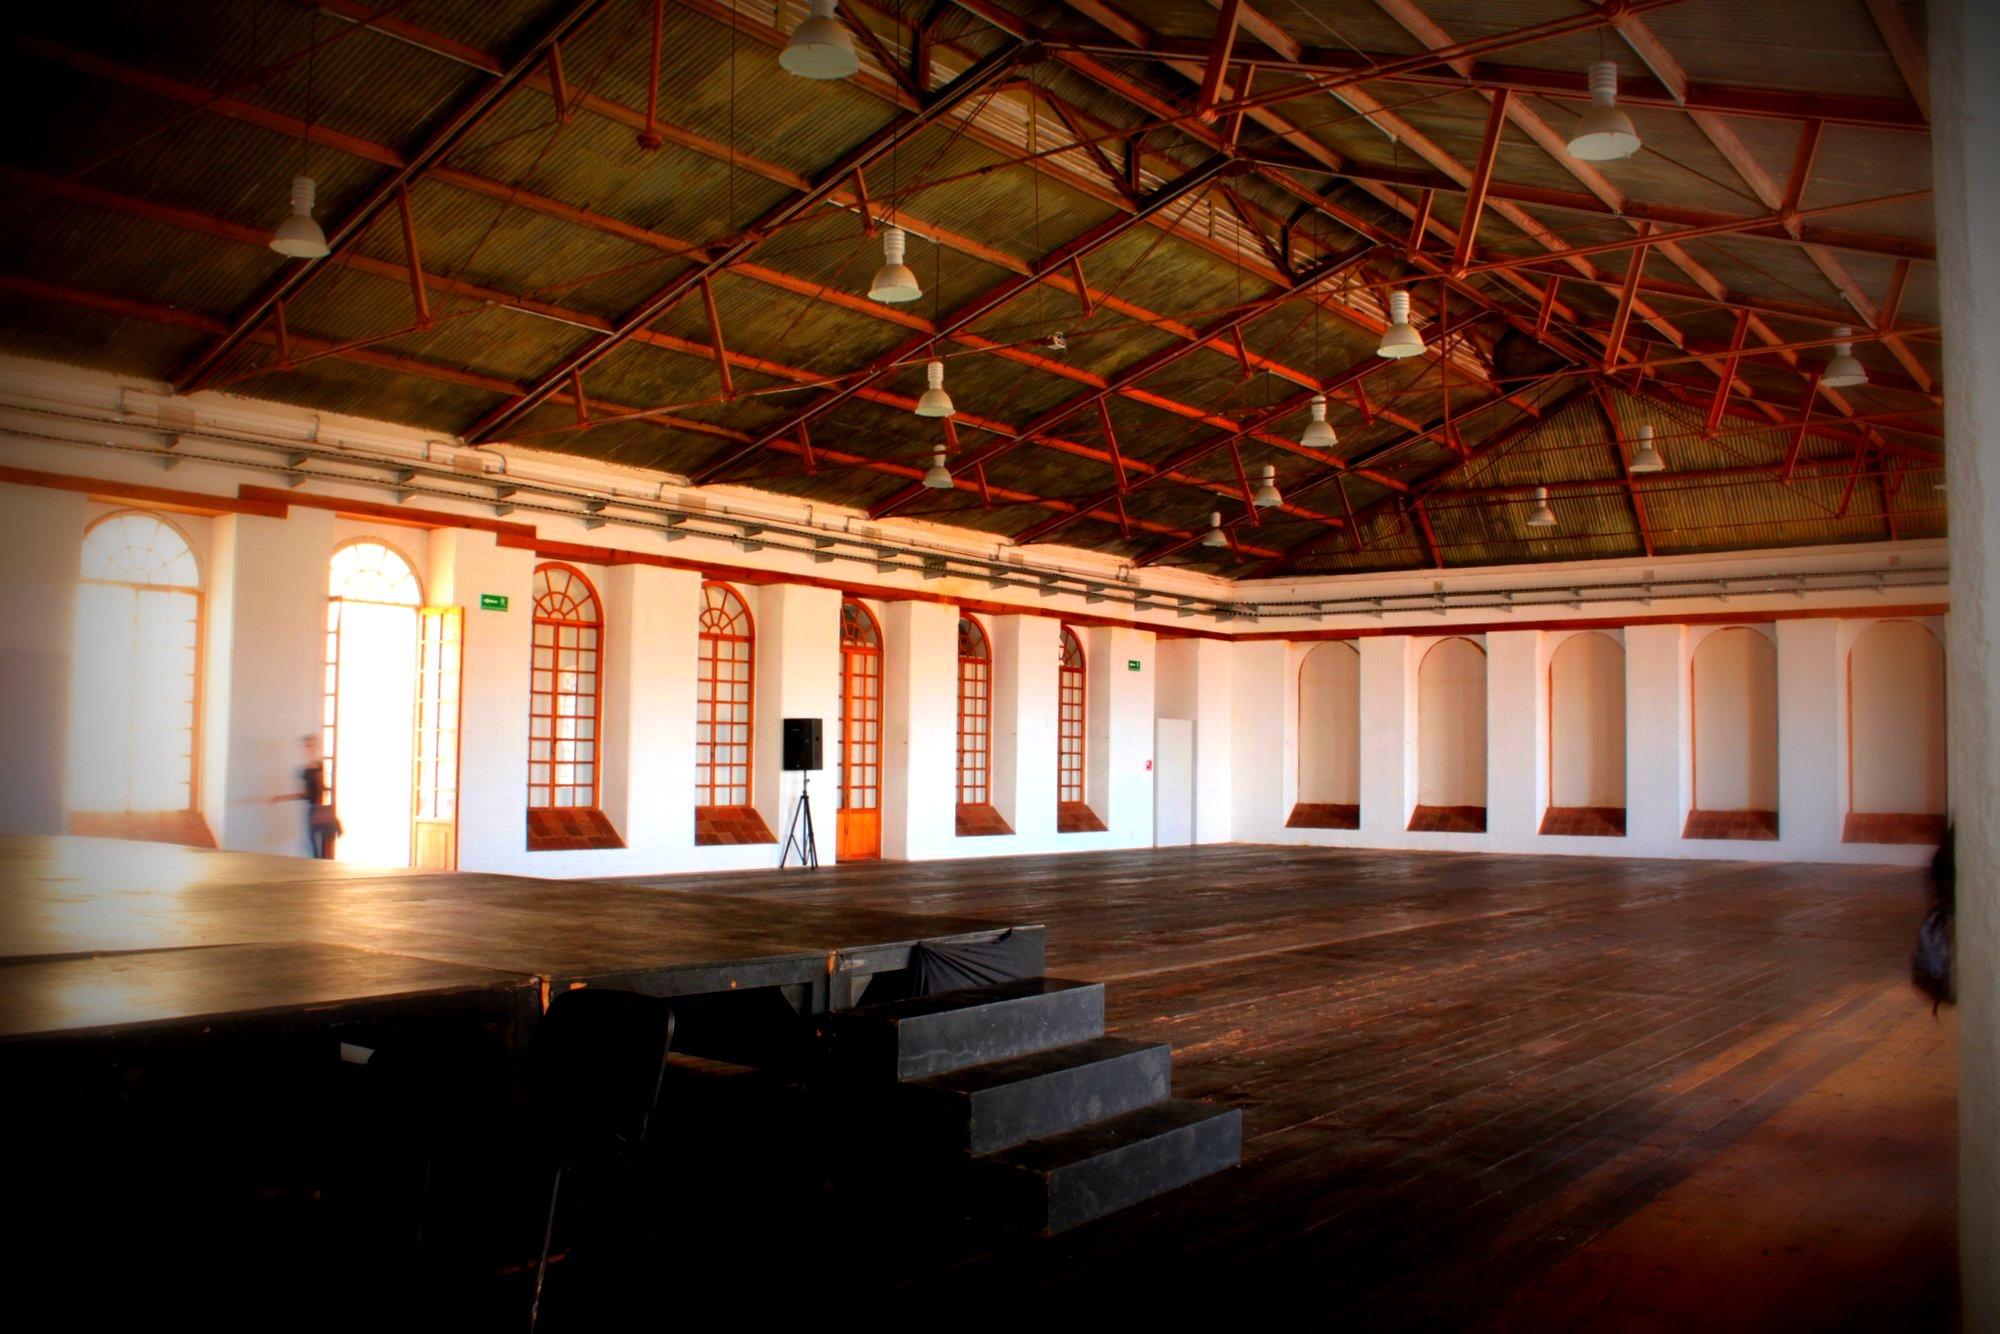 The former industrial weaving floor, now the best dance hall ever!